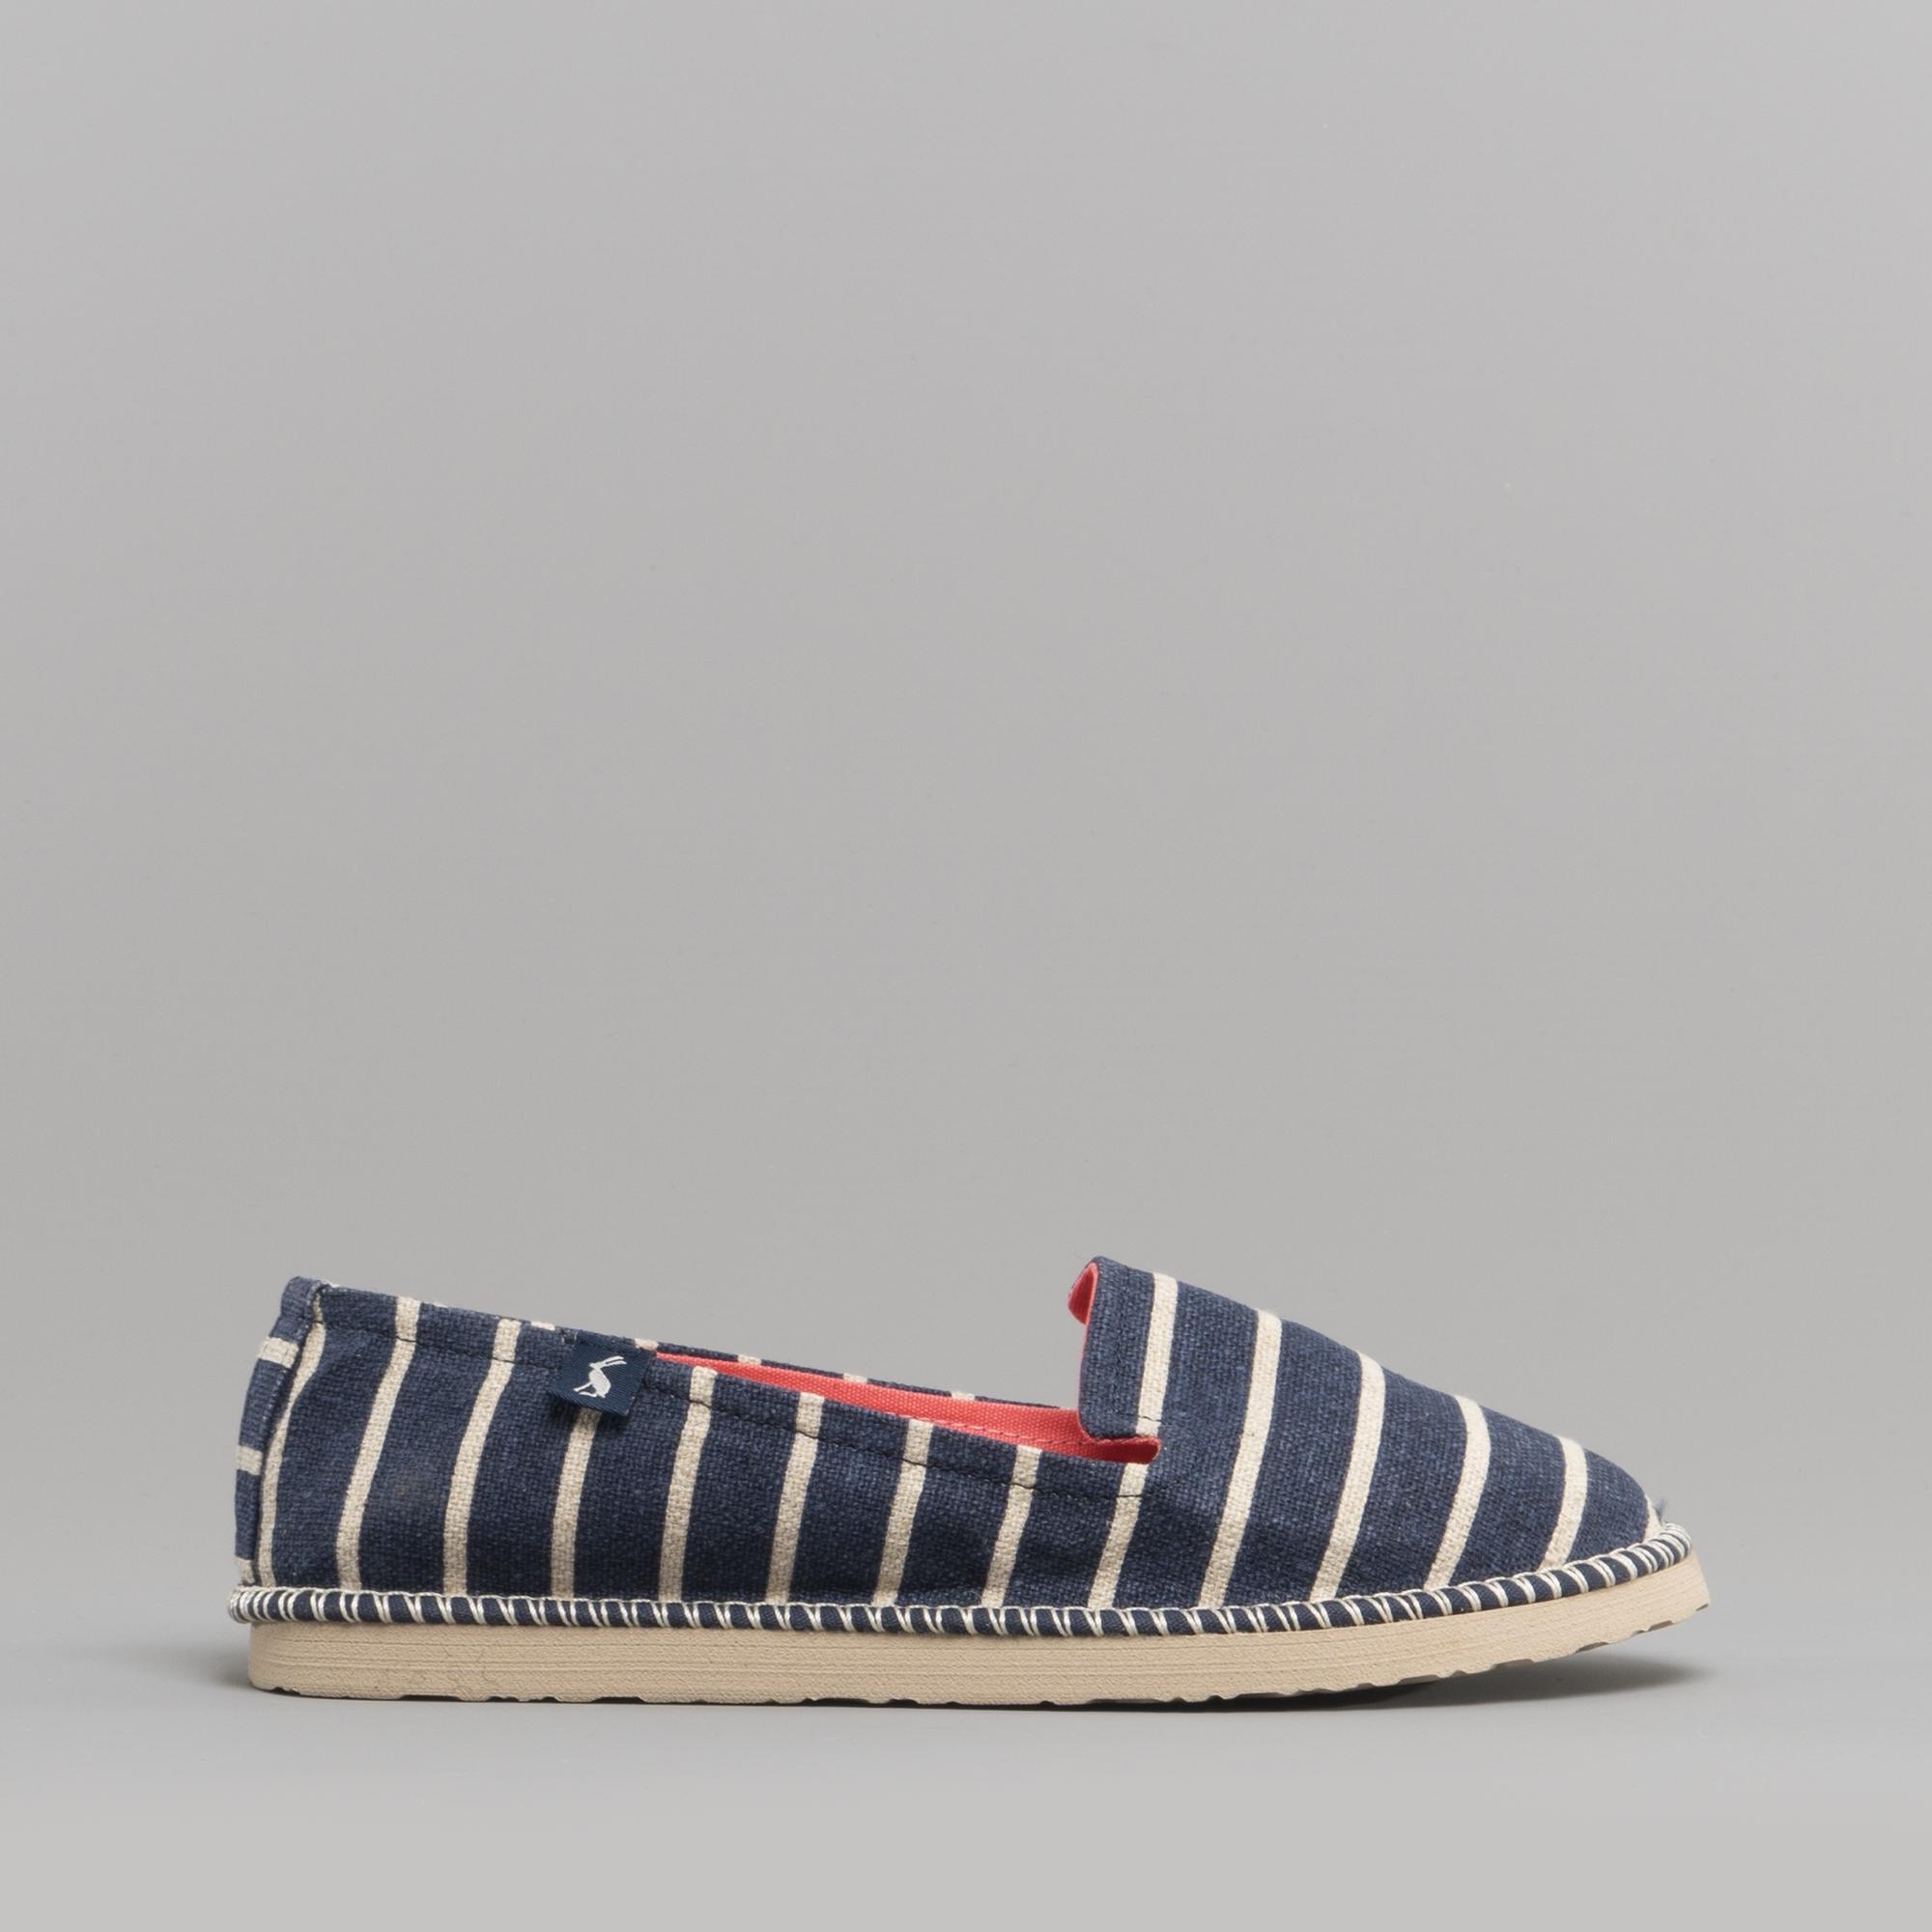 womens canvas shoes uk